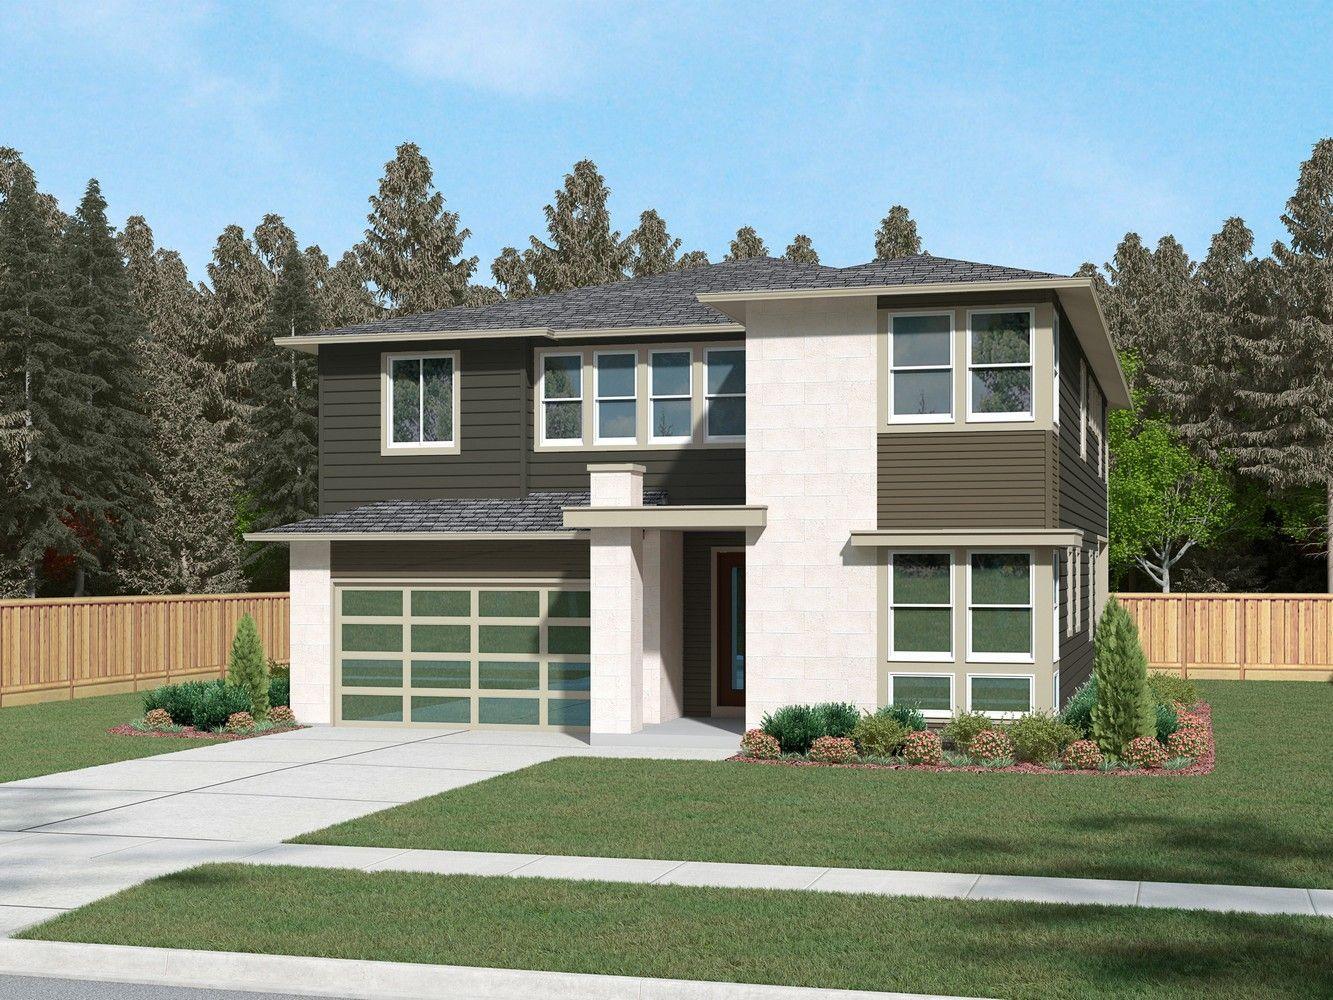 Single Family for Sale at Jacobs Landing - Residence H-341 3244 234th Pl Se Sammamish, Washington 98075 United States